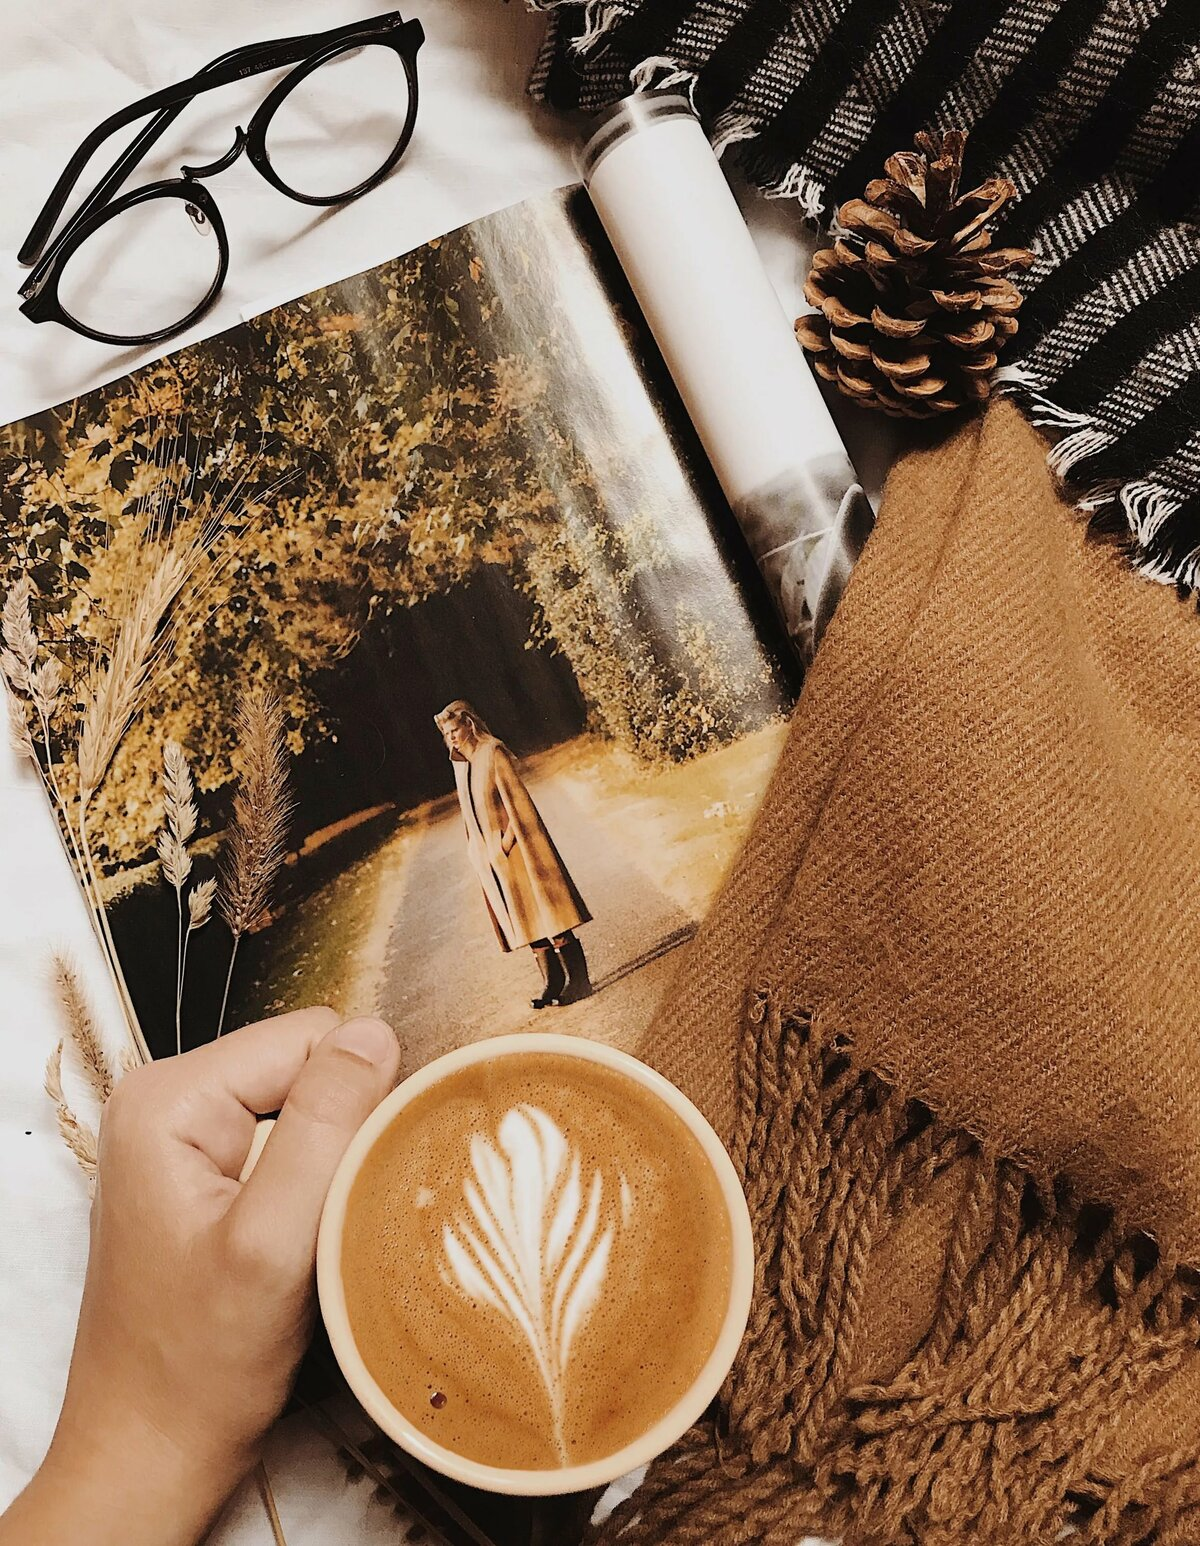 Картинки в стиле кофе